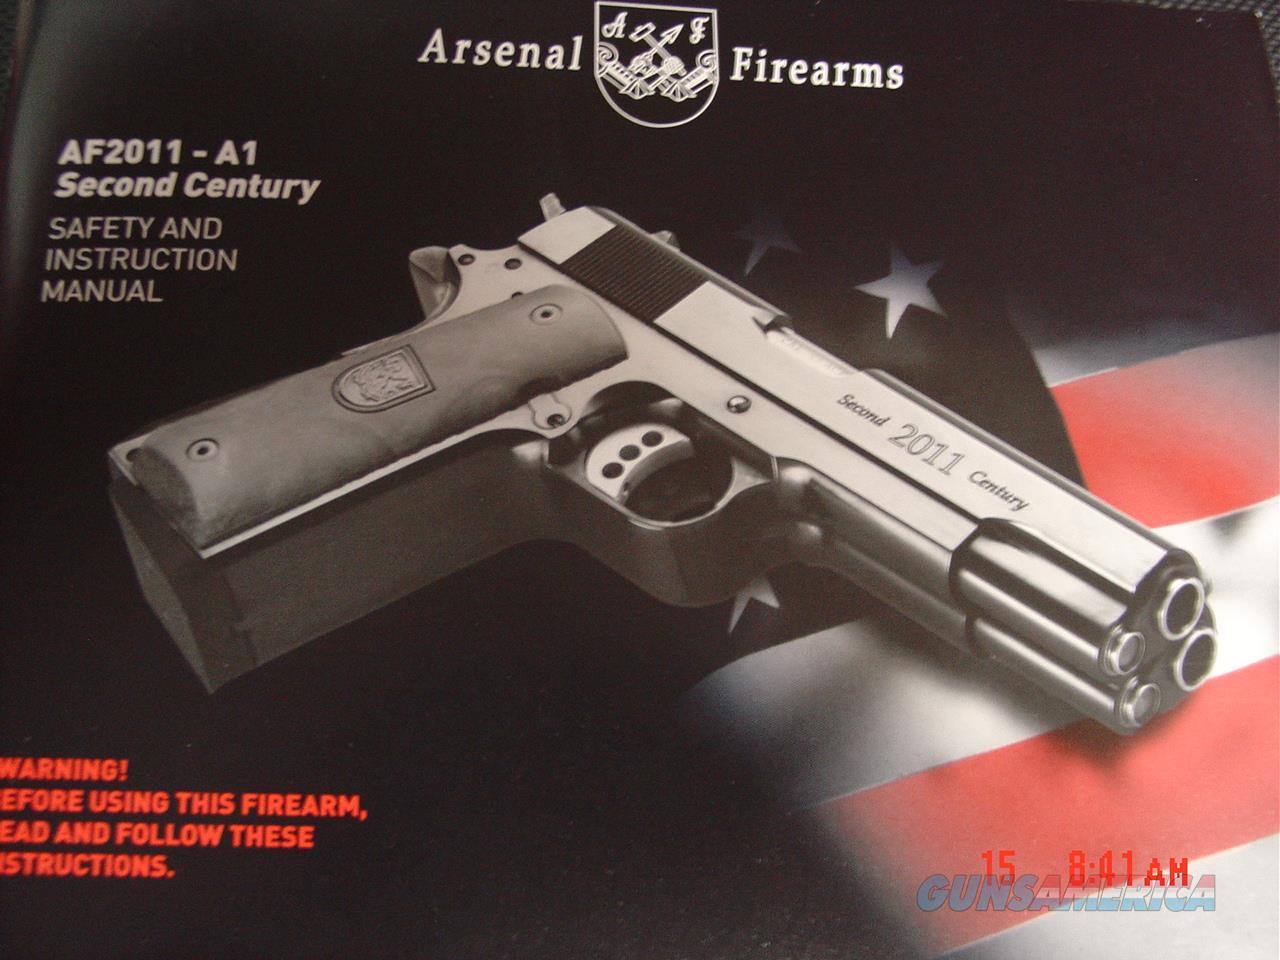 Arsenal Firearms,rare double barrel 9mm, 16 shots, 2 mags,walnut grips,  Guns > Pistols > 1911 Pistol Copies (non-Colt)